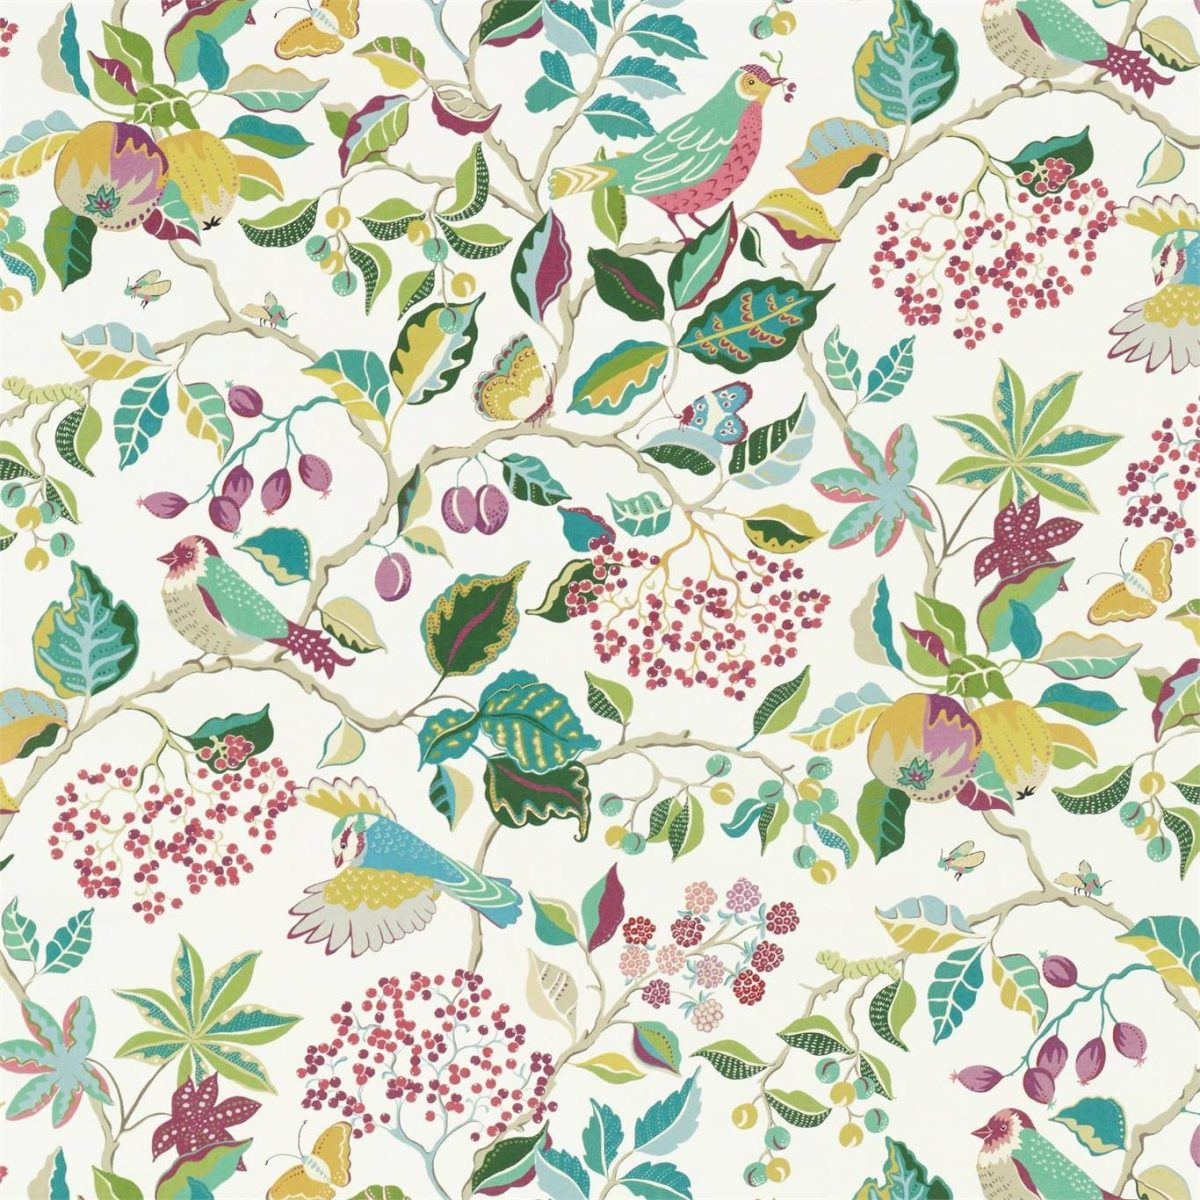 Sanderson Tyg Birds and Berries Fern